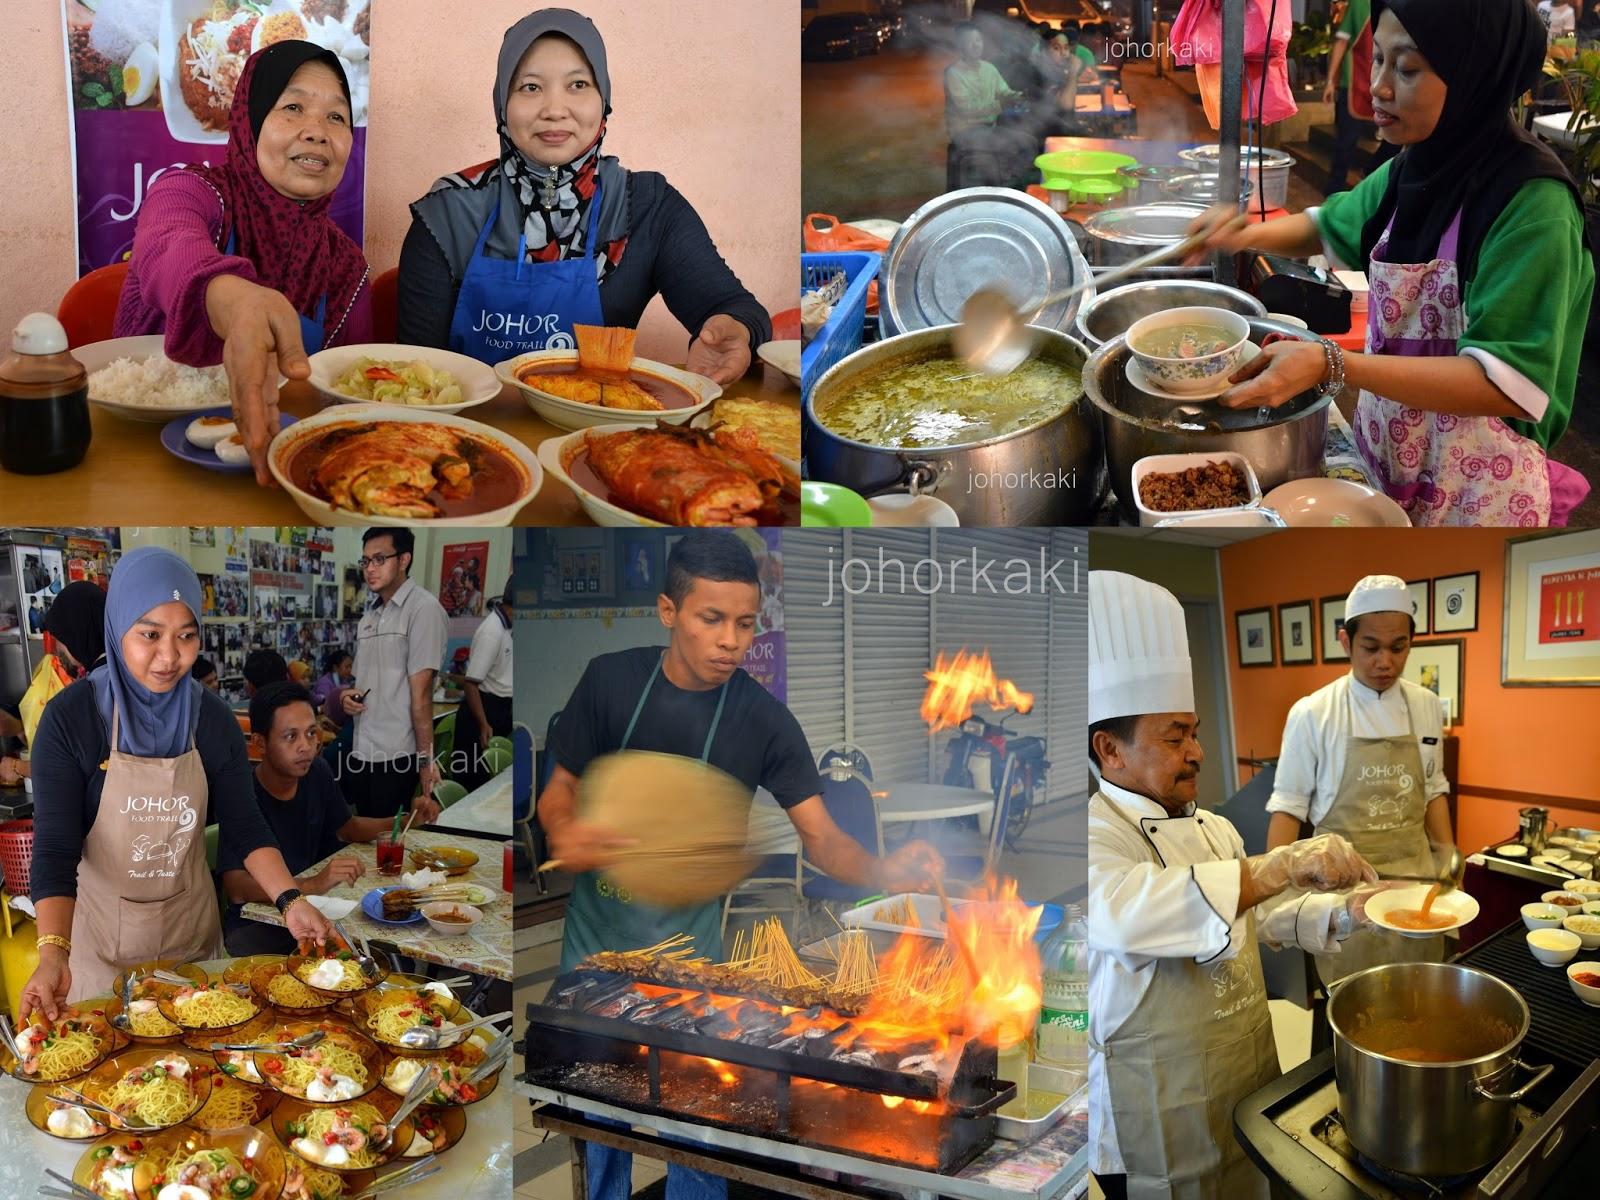 Muar Malaysia  city pictures gallery : Muar Food Trail by Tourism Malaysia Johor  joHoR kAki jB sINGApoRE ...